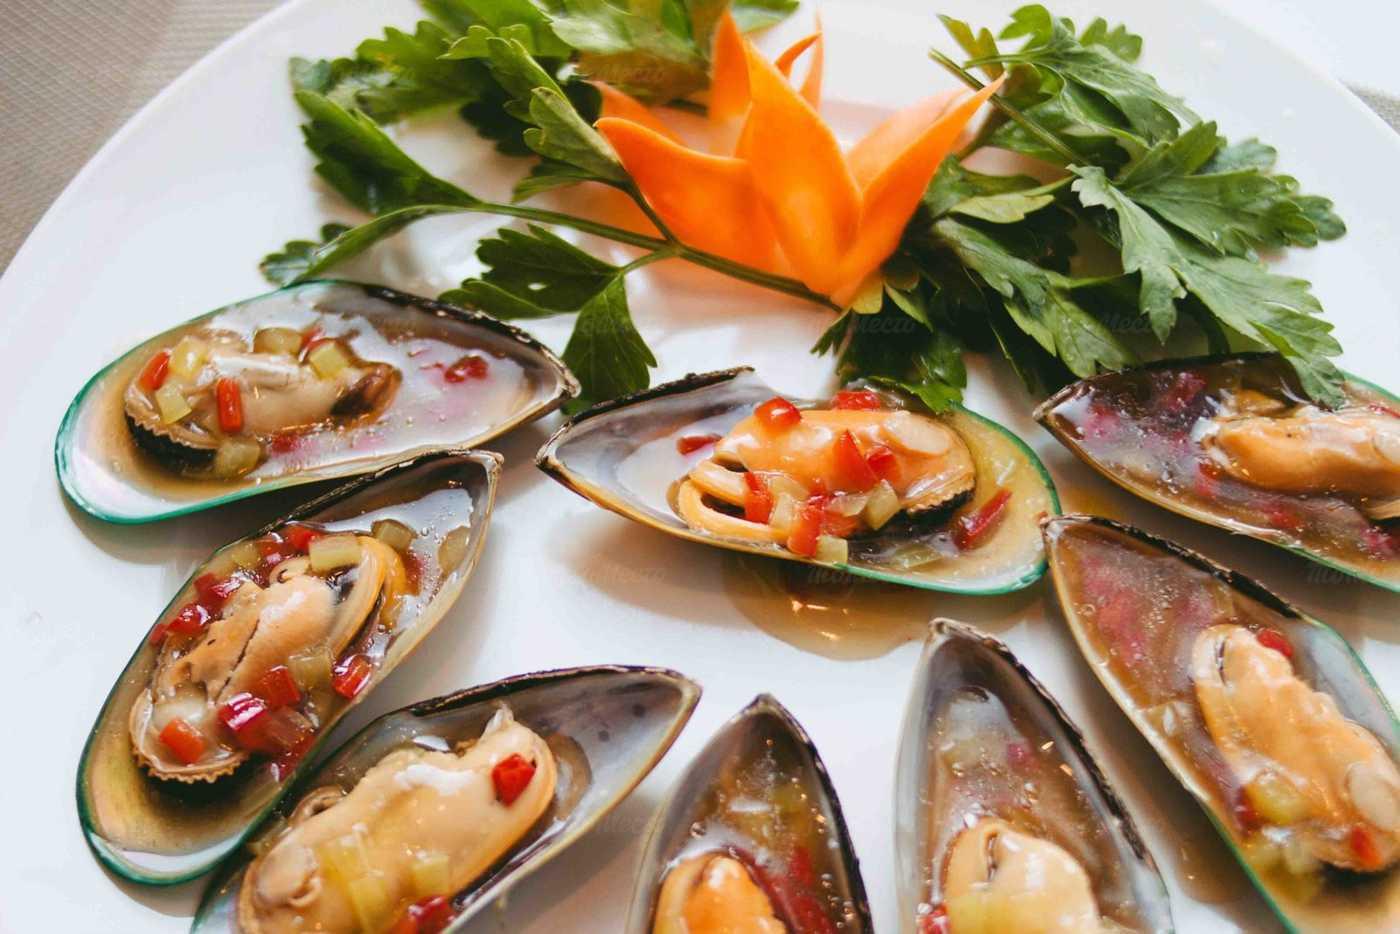 Меню ресторана Цзао Ван на Перекопской фото 43